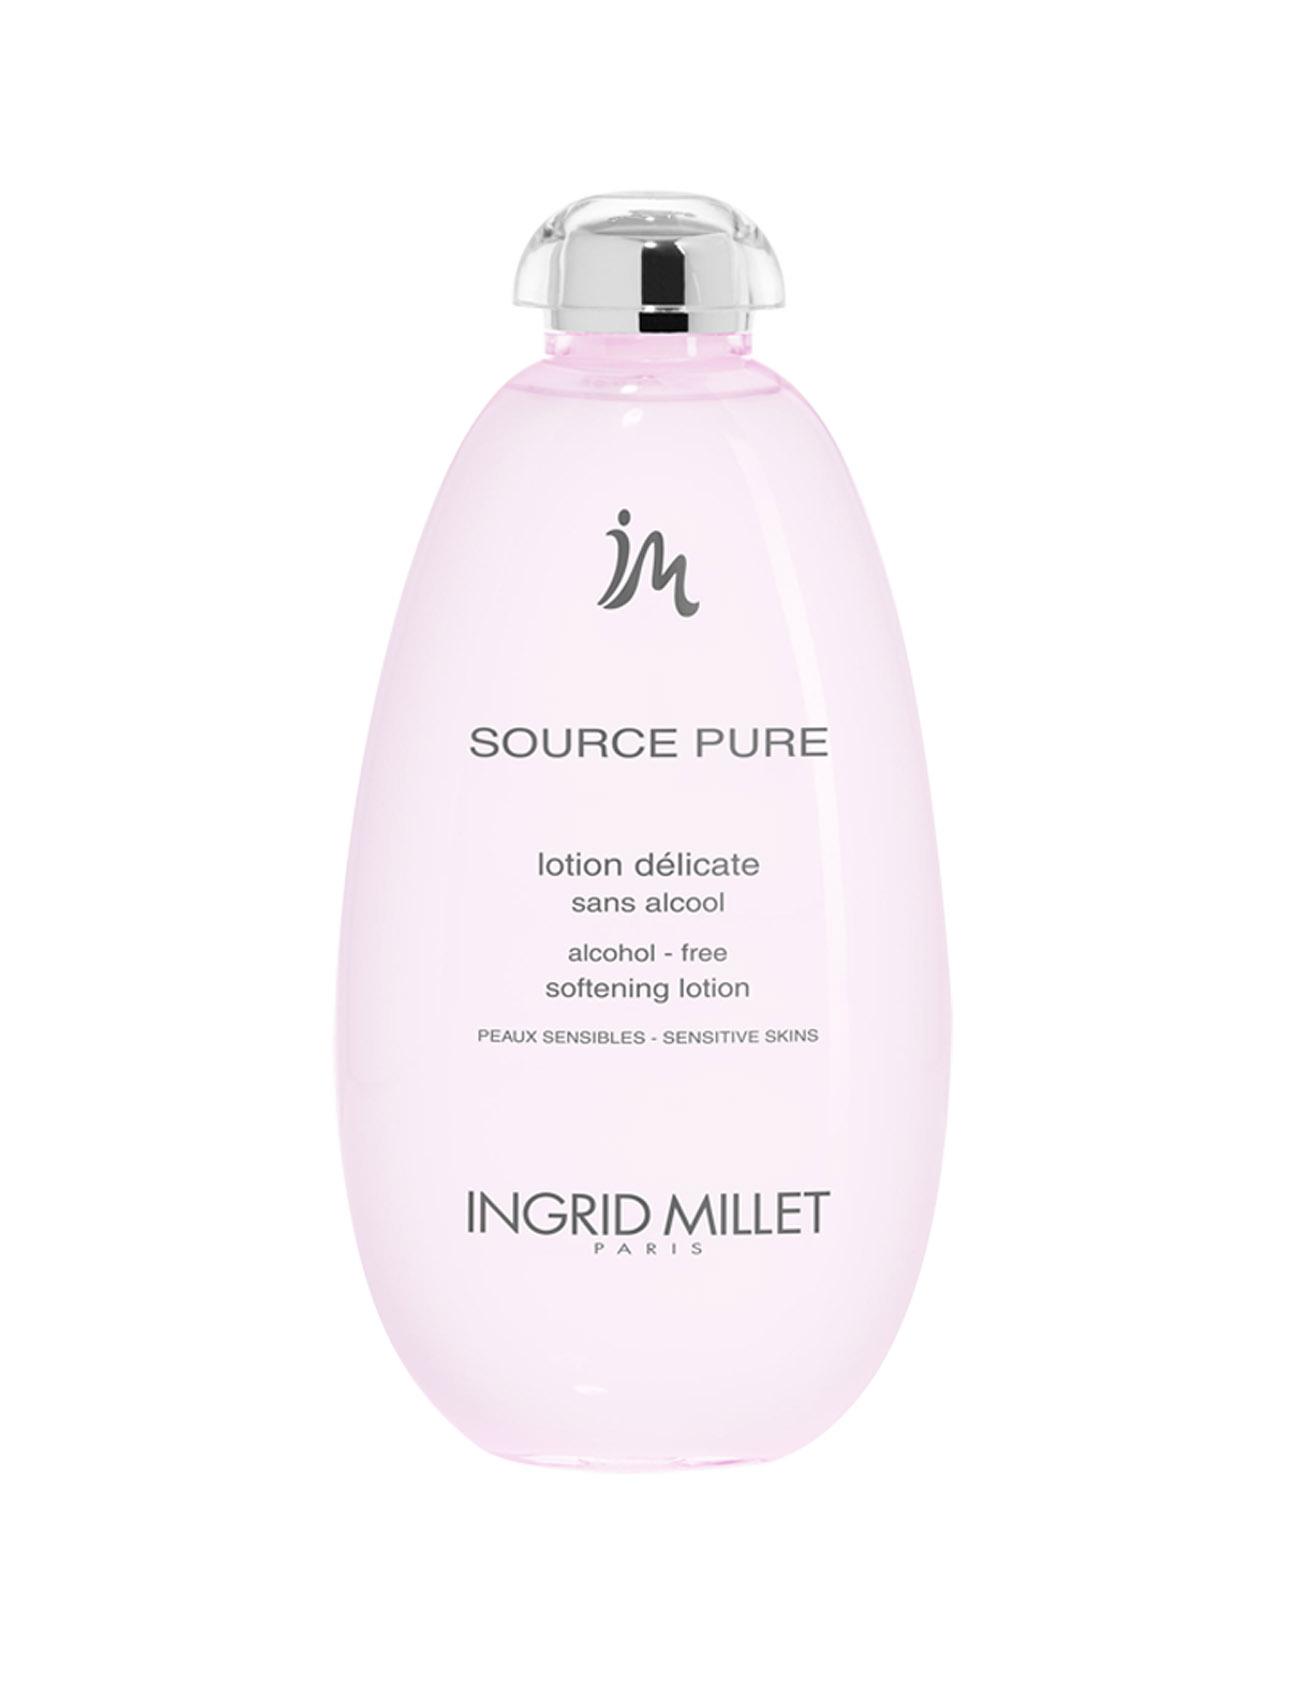 3-Lotion-Delicate-Tonico-calmante-Ingrid-Millet-Linea-cosmetici-di-lusso-Source-Pure-Dispar-SpA.jpg